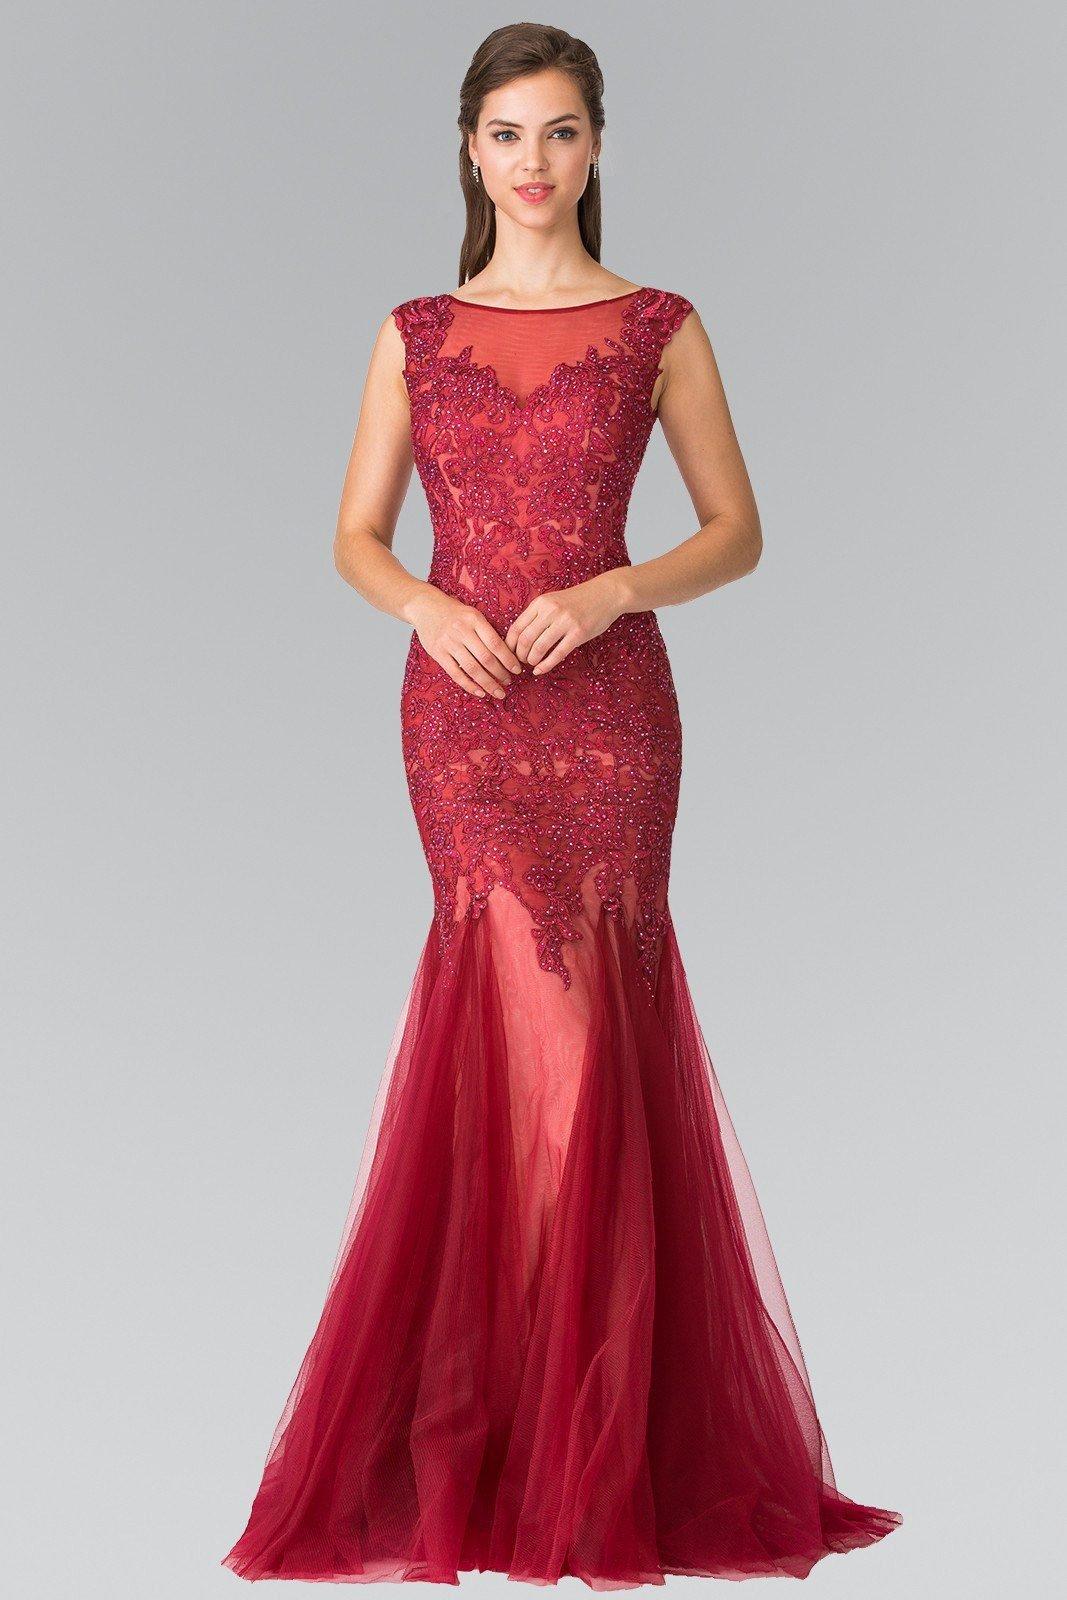 Glamorous dresses cheap glamorous 2017 mermaid prom dress gl#2319 - simply fab dress IJQDLYS